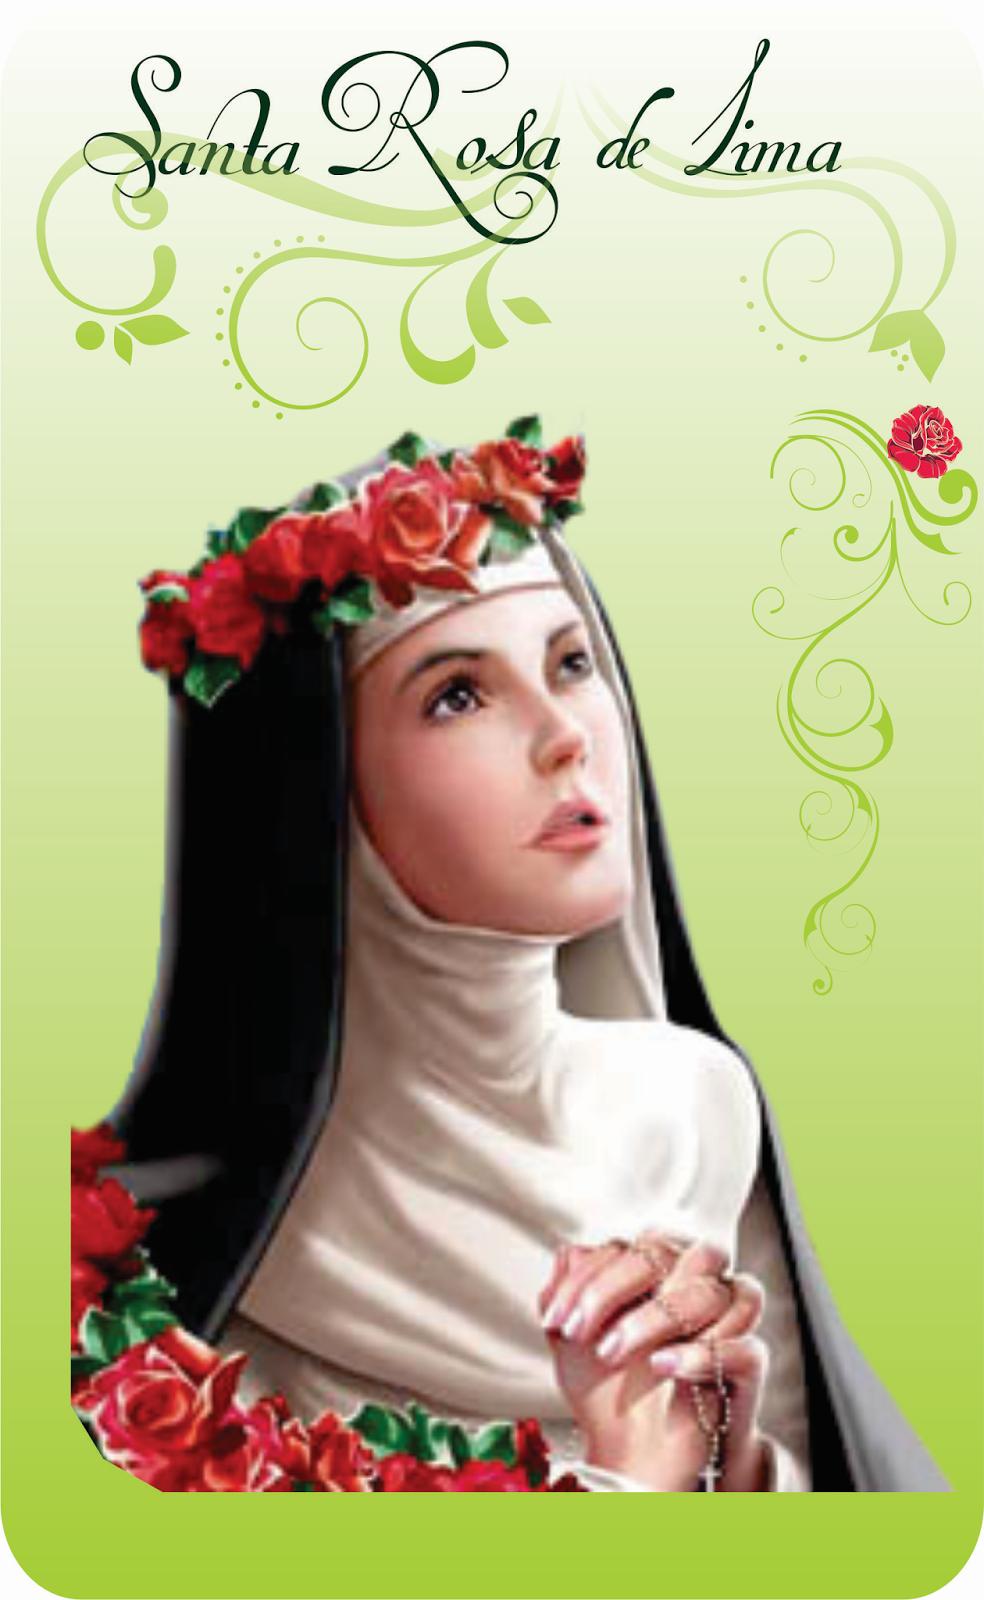 santa rosa de lima - Buscar con Google   c:   Pinterest   Lima